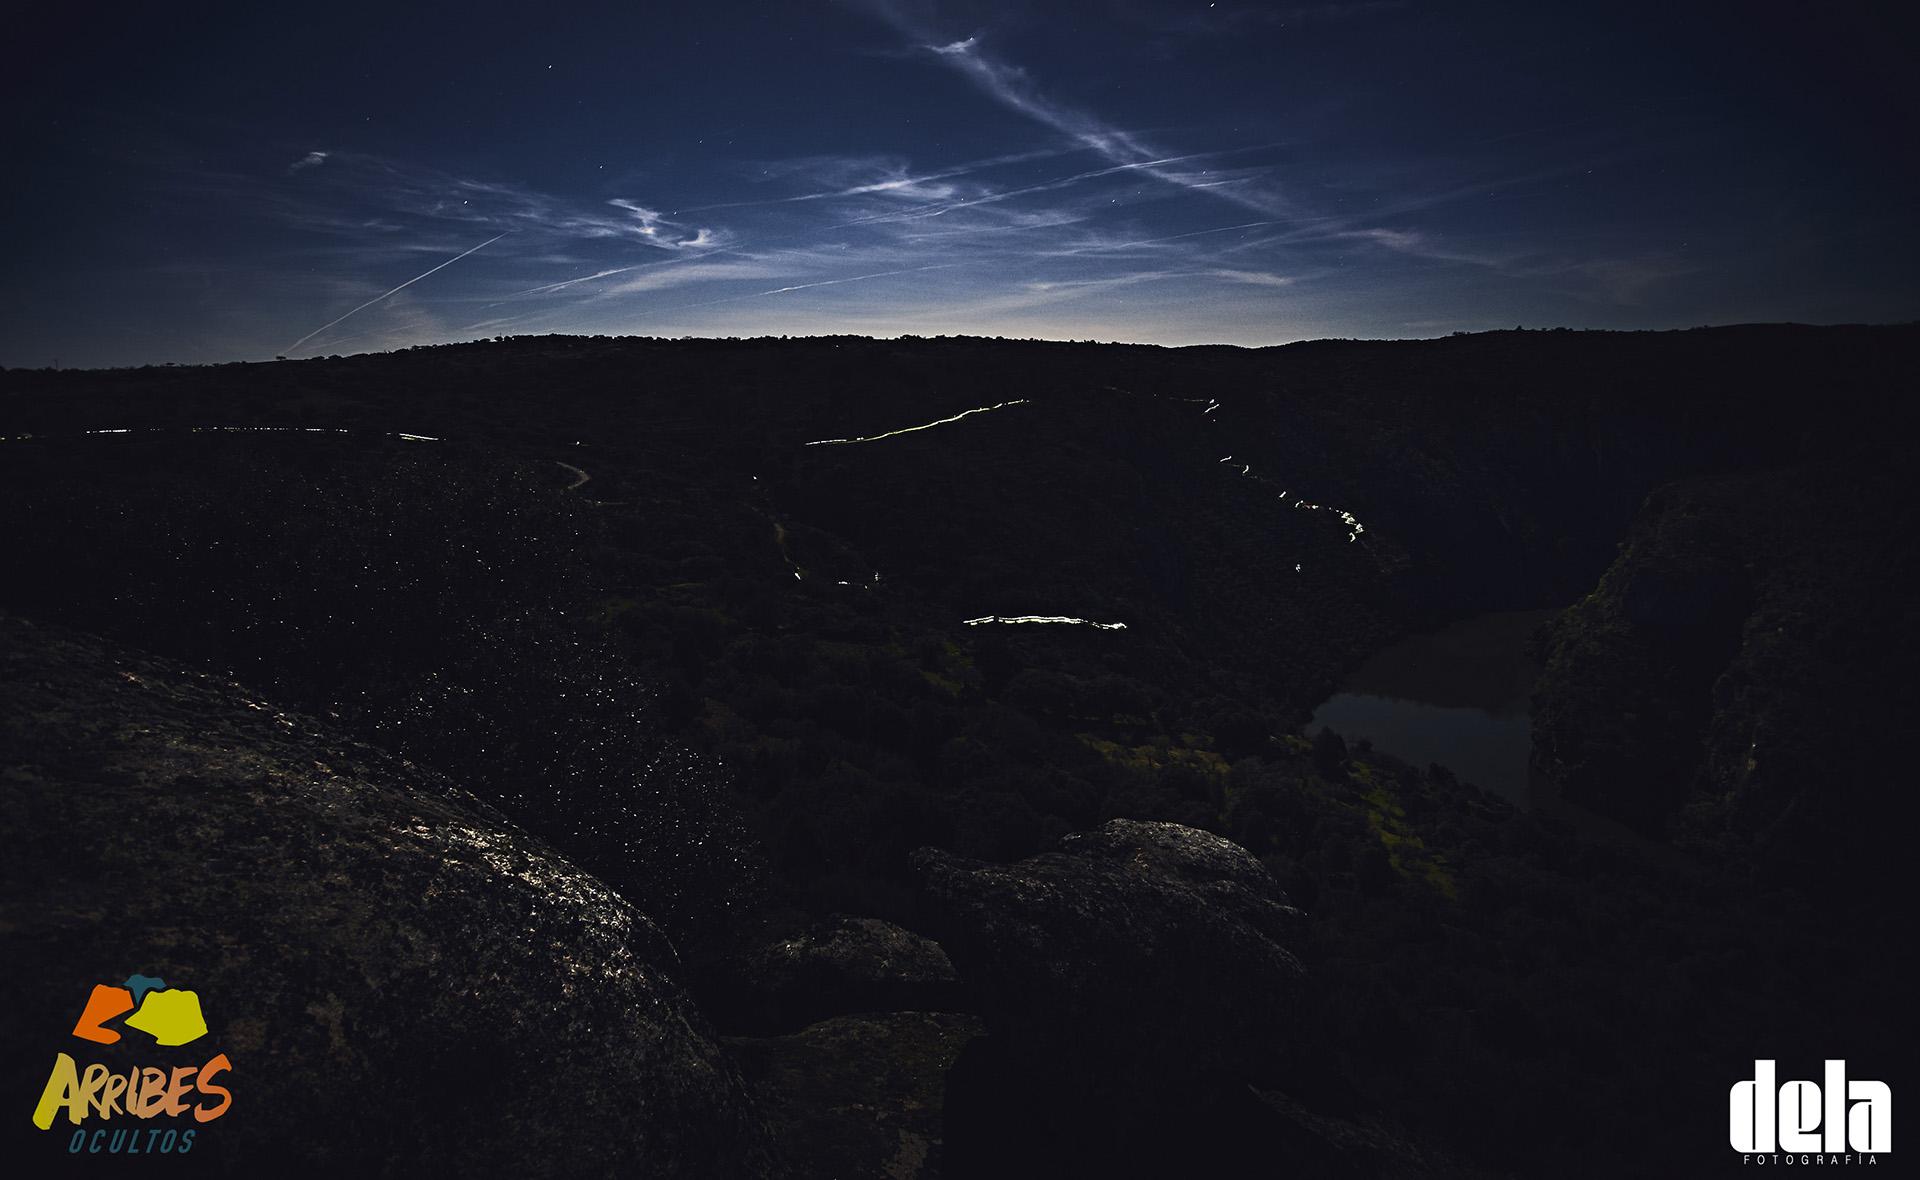 Slider 2020 - Arribes Ocultos Trail - 10